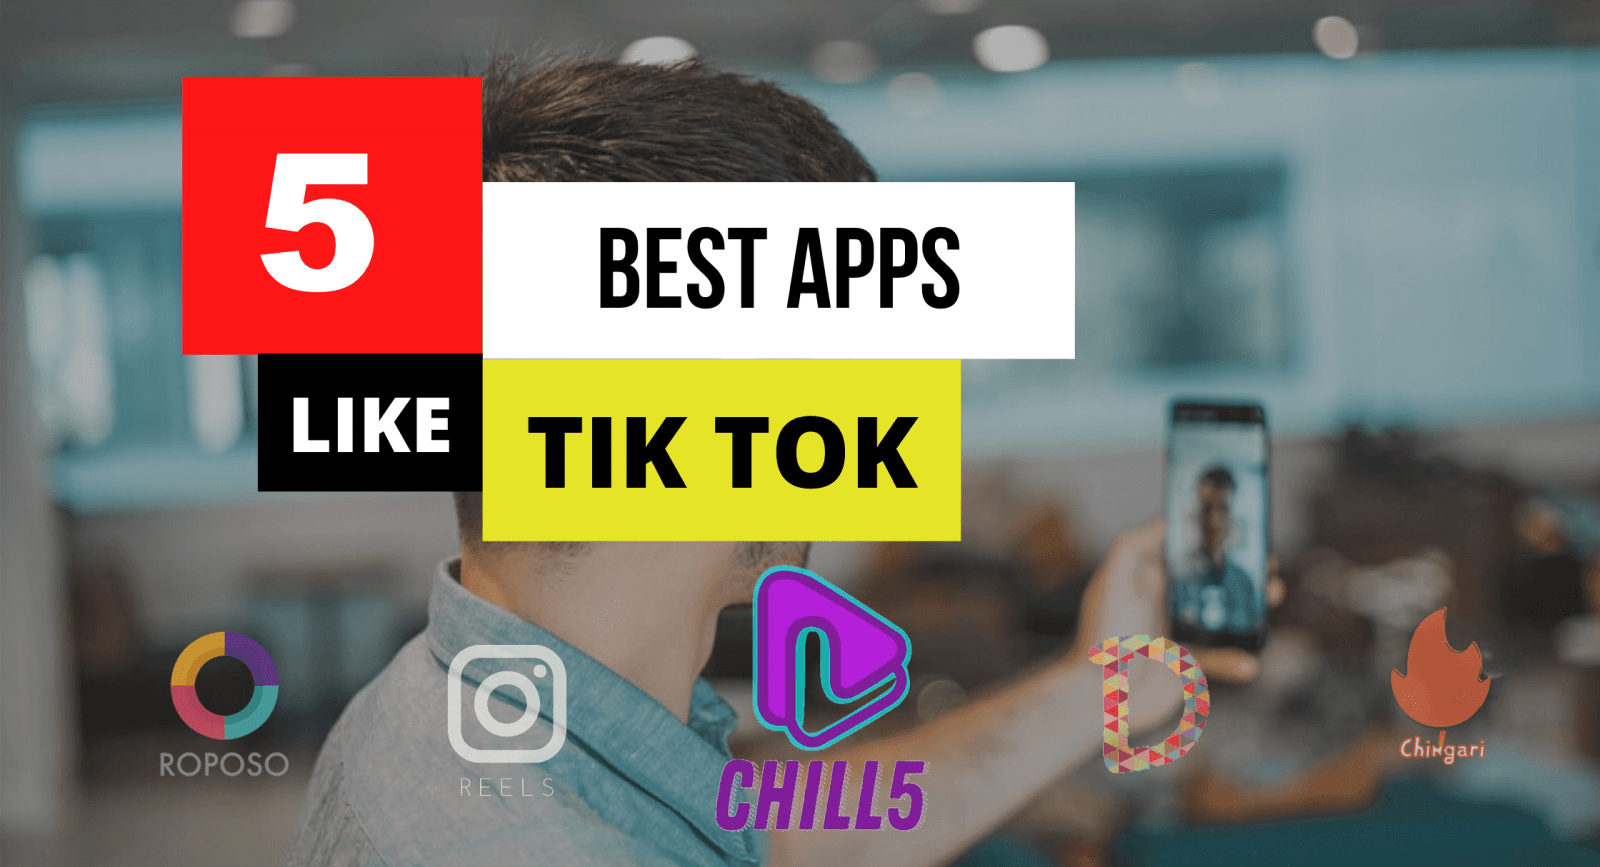 TIkTok alternative chill5